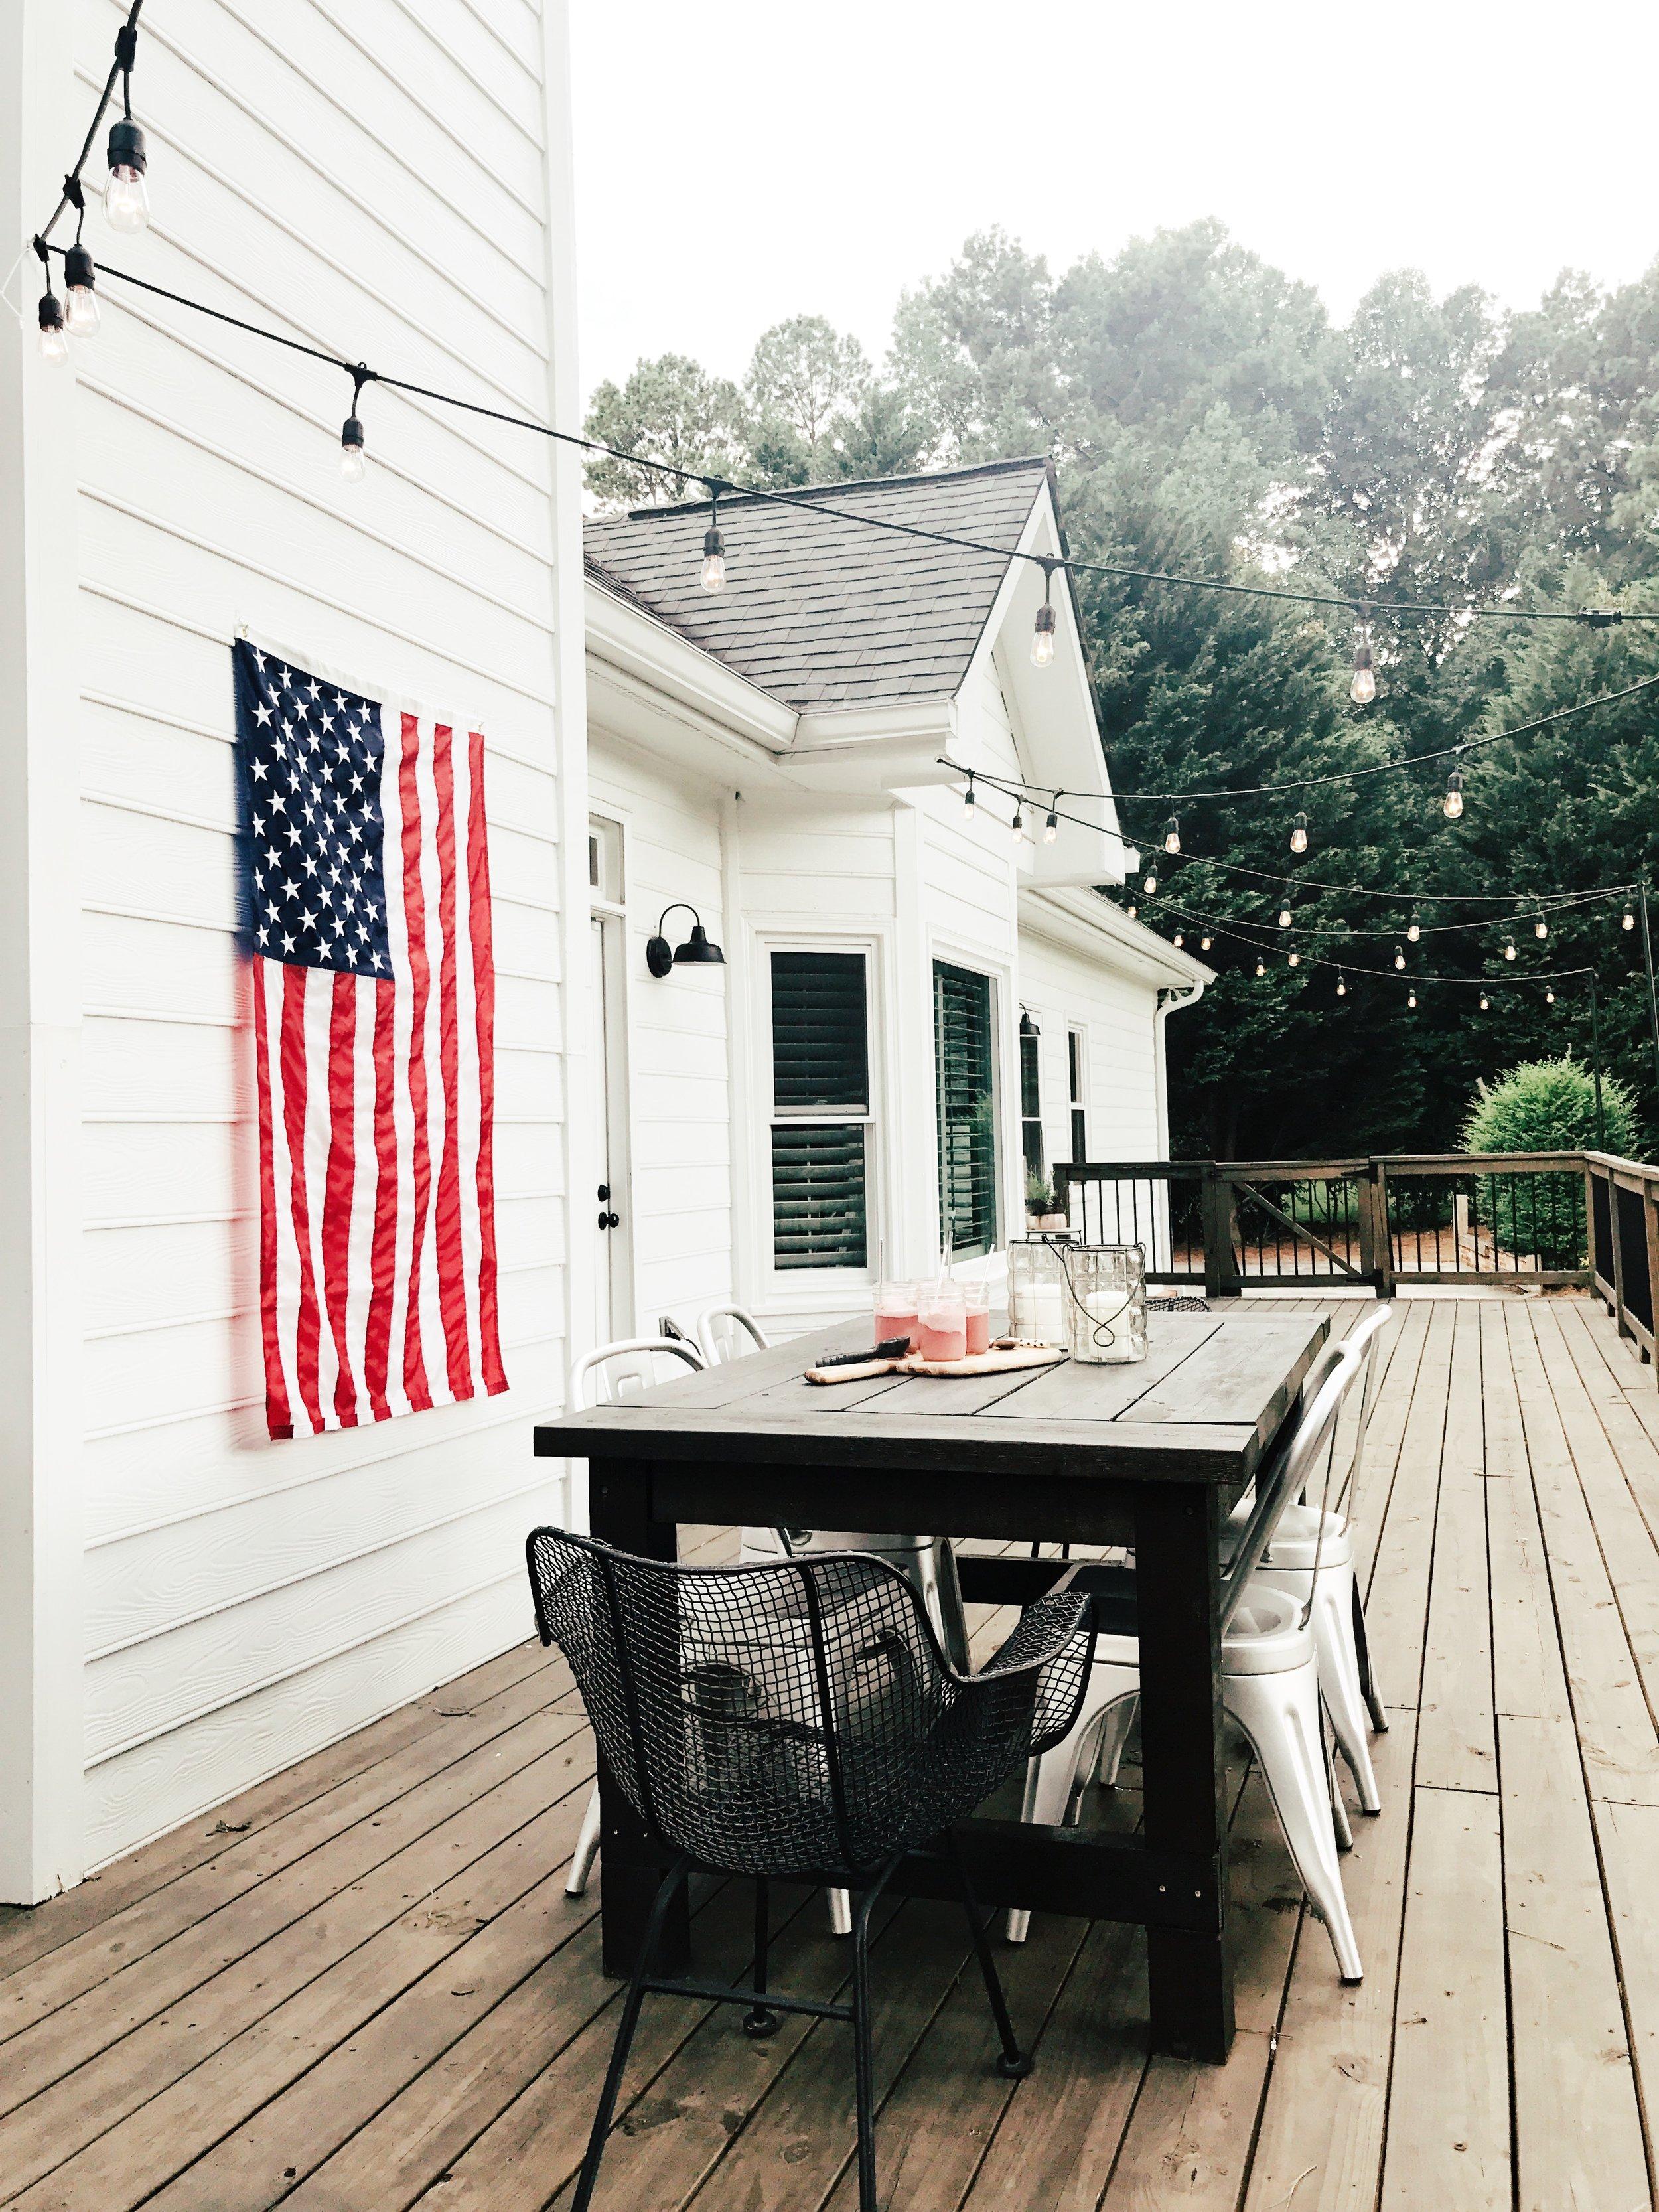 backyard-design-decor-deck-inspiration-inspo-casa-de-colleen.jpg